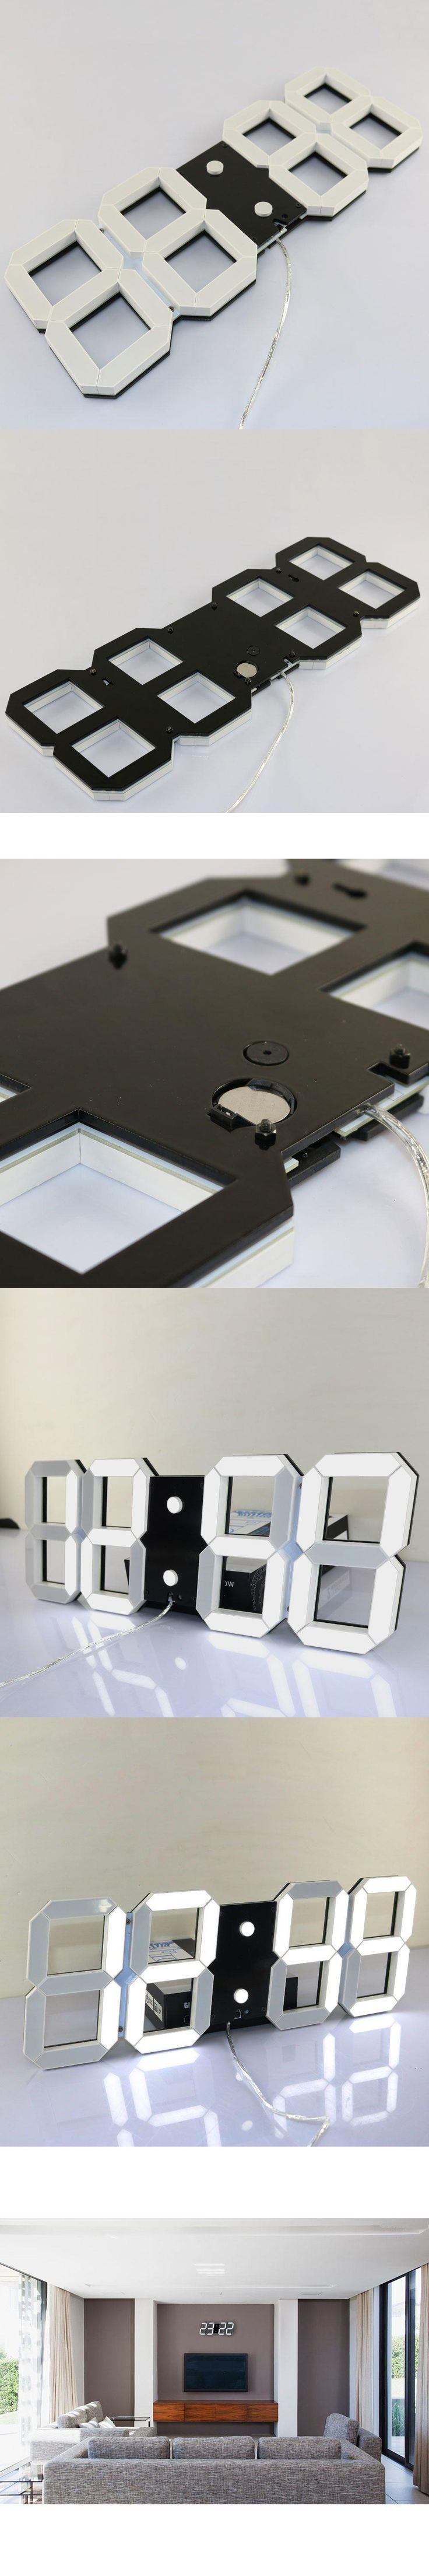 Super Large Digital Wall Clocks LED Alarm Clock Countdown Timer Remote Control Oversize Jumbo Number LED Display Snooze